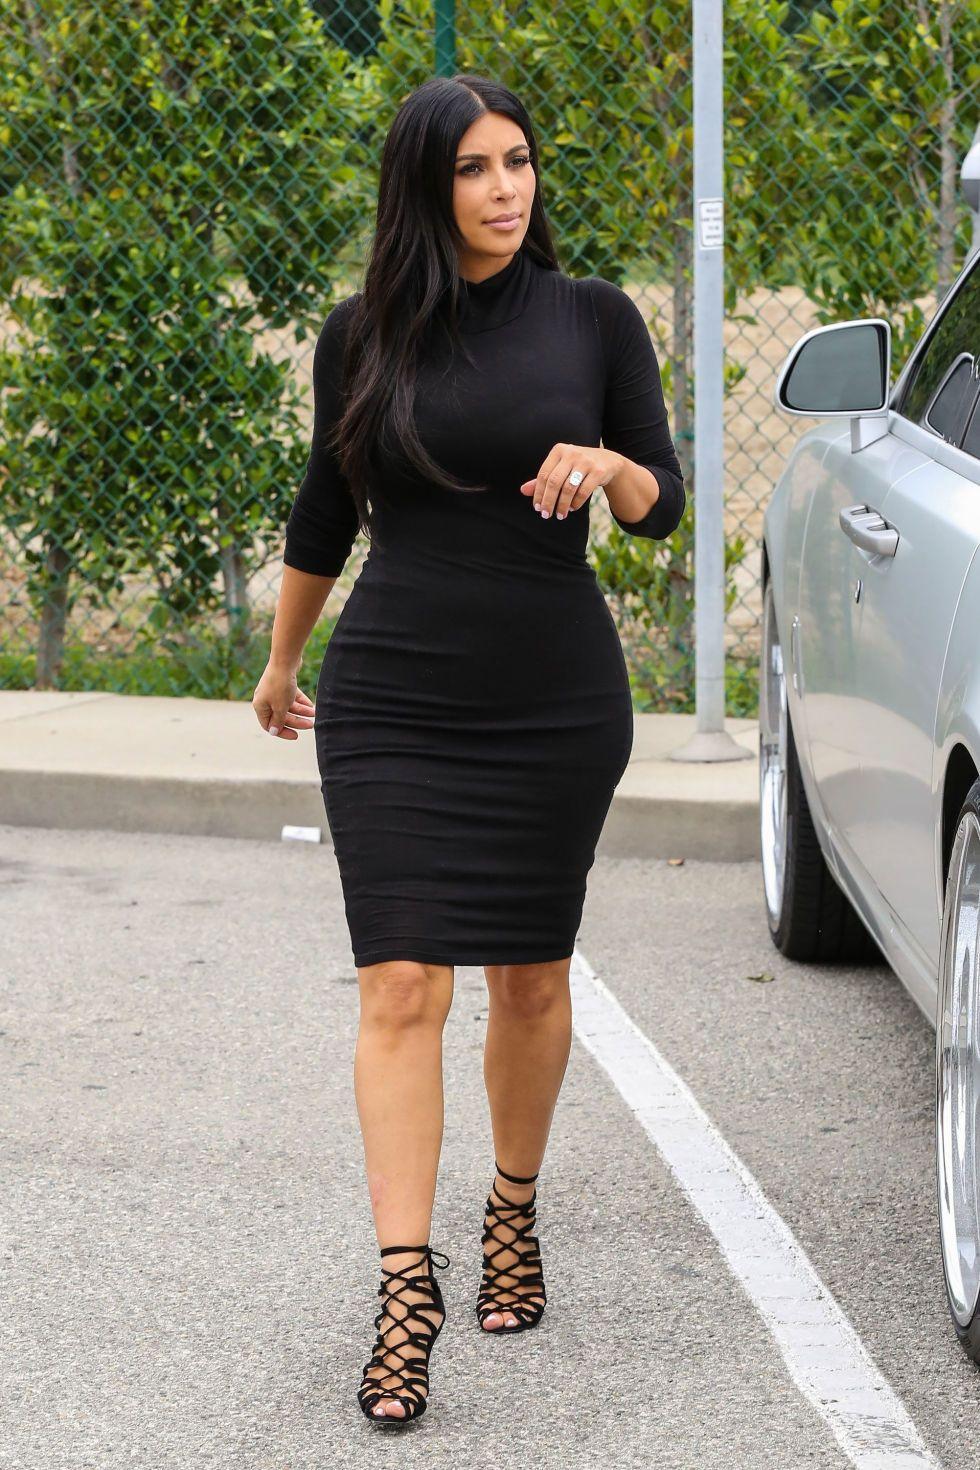 Kim Kardashian Look Pesquisa Google Kardashian 39 S Style Pinterest Kim Kardashian